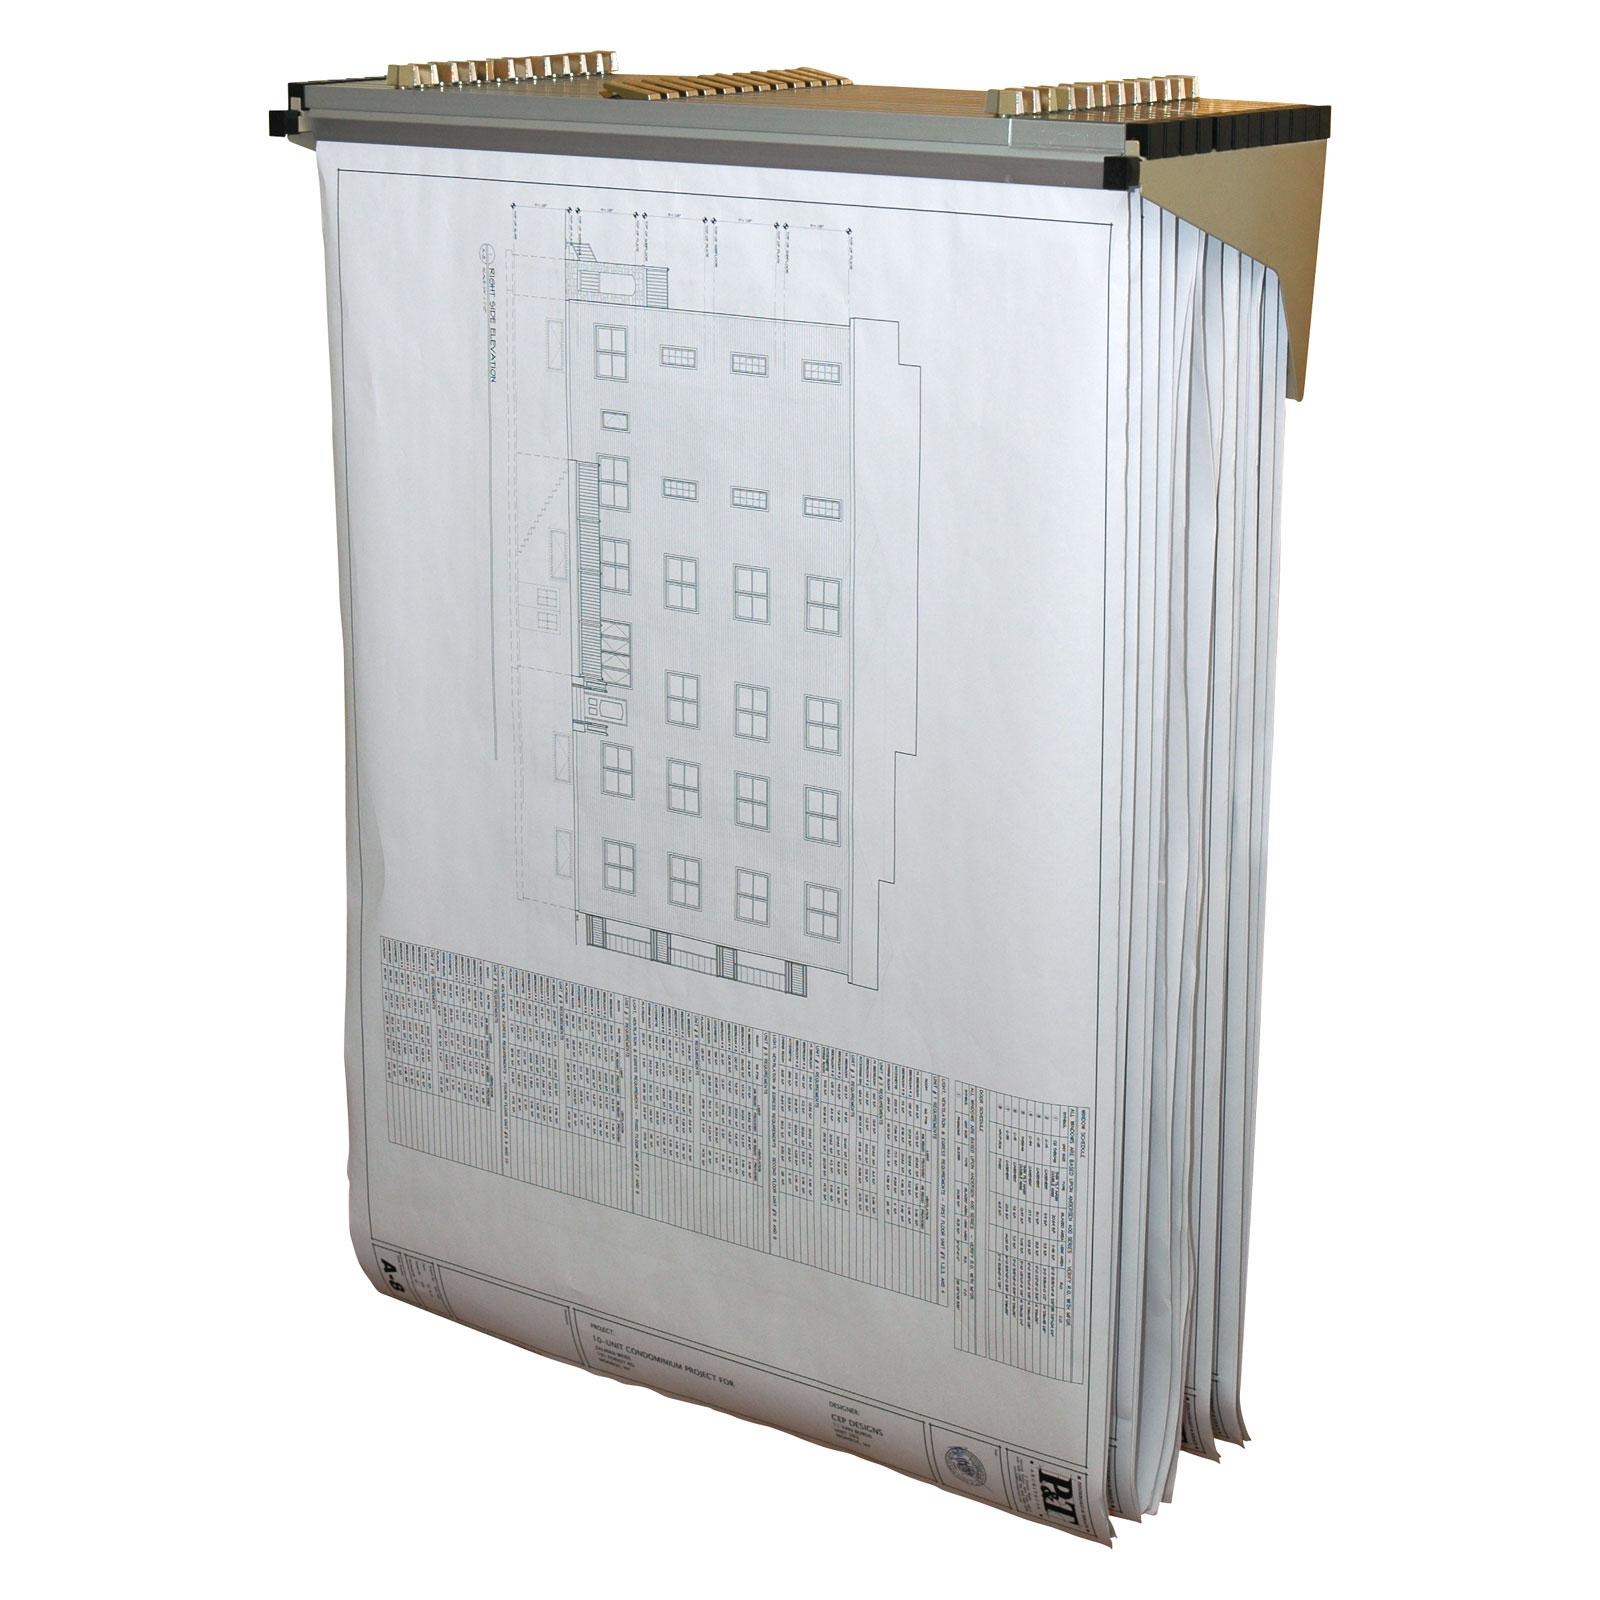 Blueprint wall rack in blueprint storage blueprint wall rack image malvernweather Images